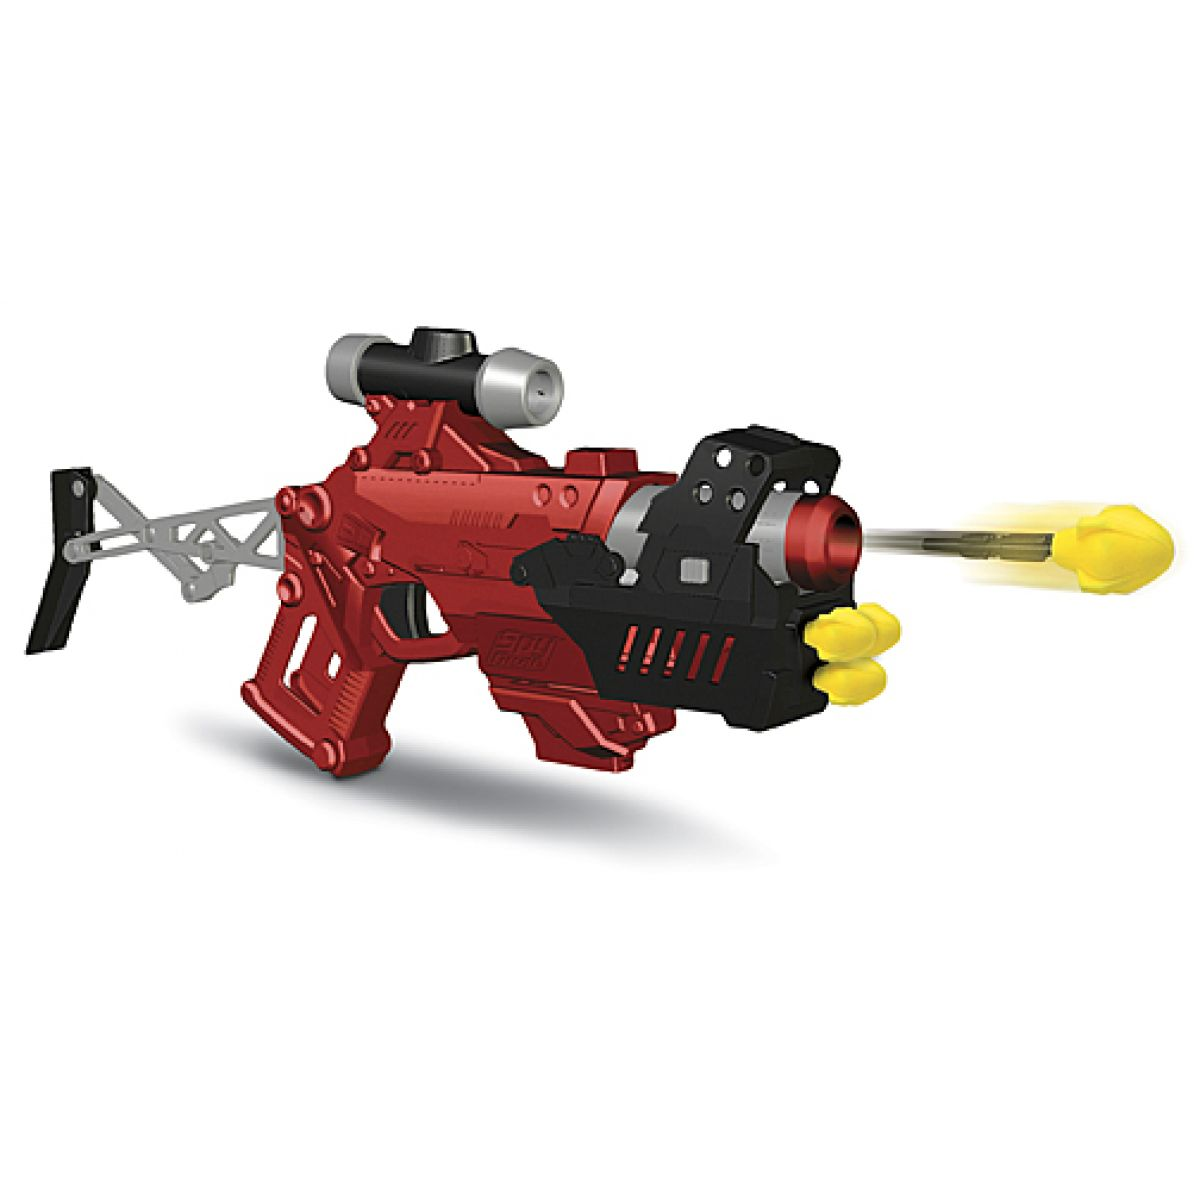 Spy Gear 70296 - Viper Blaster